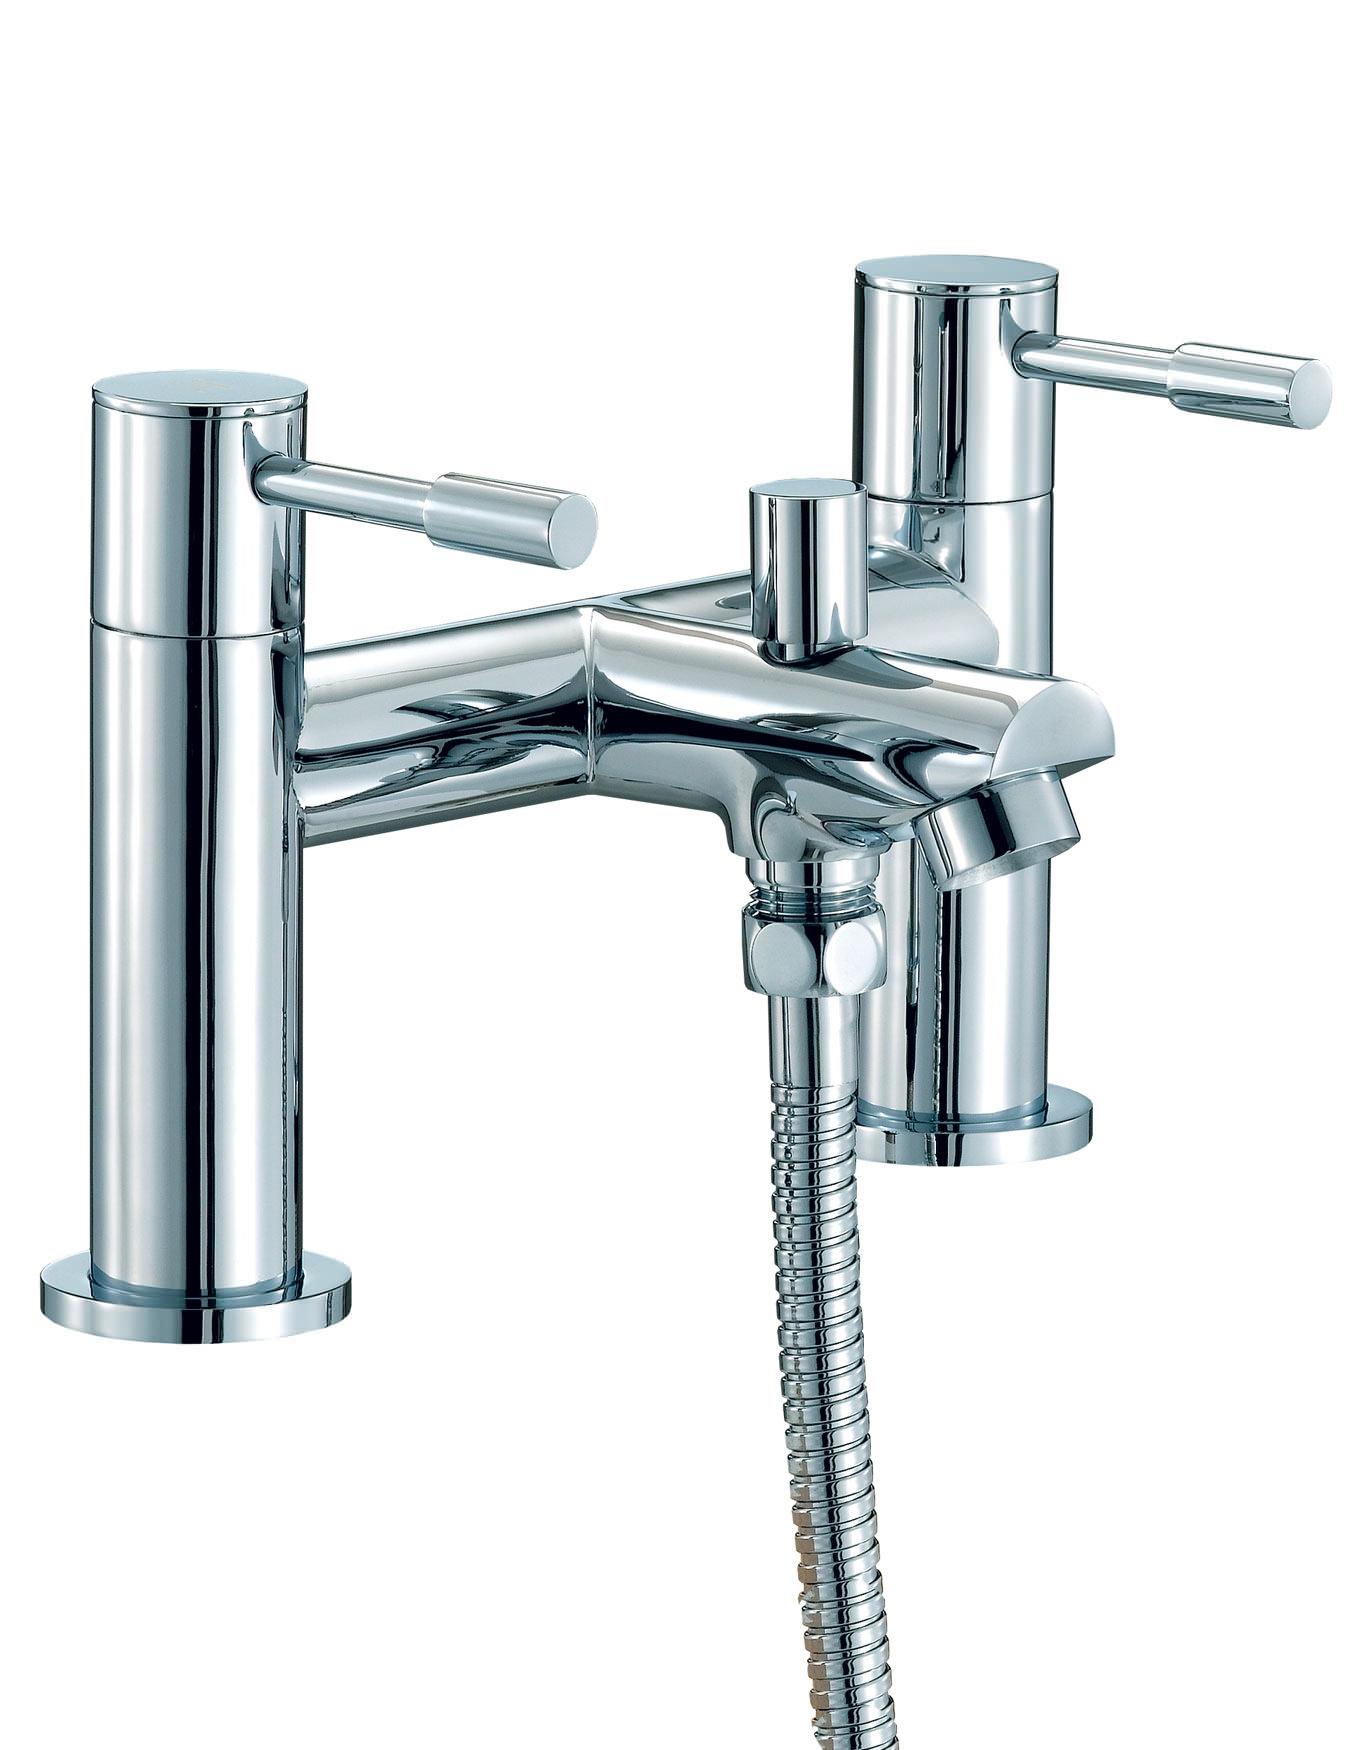 Bath Taps: Mayfair Series F Bath Shower Mixer Tap With No1 Kit